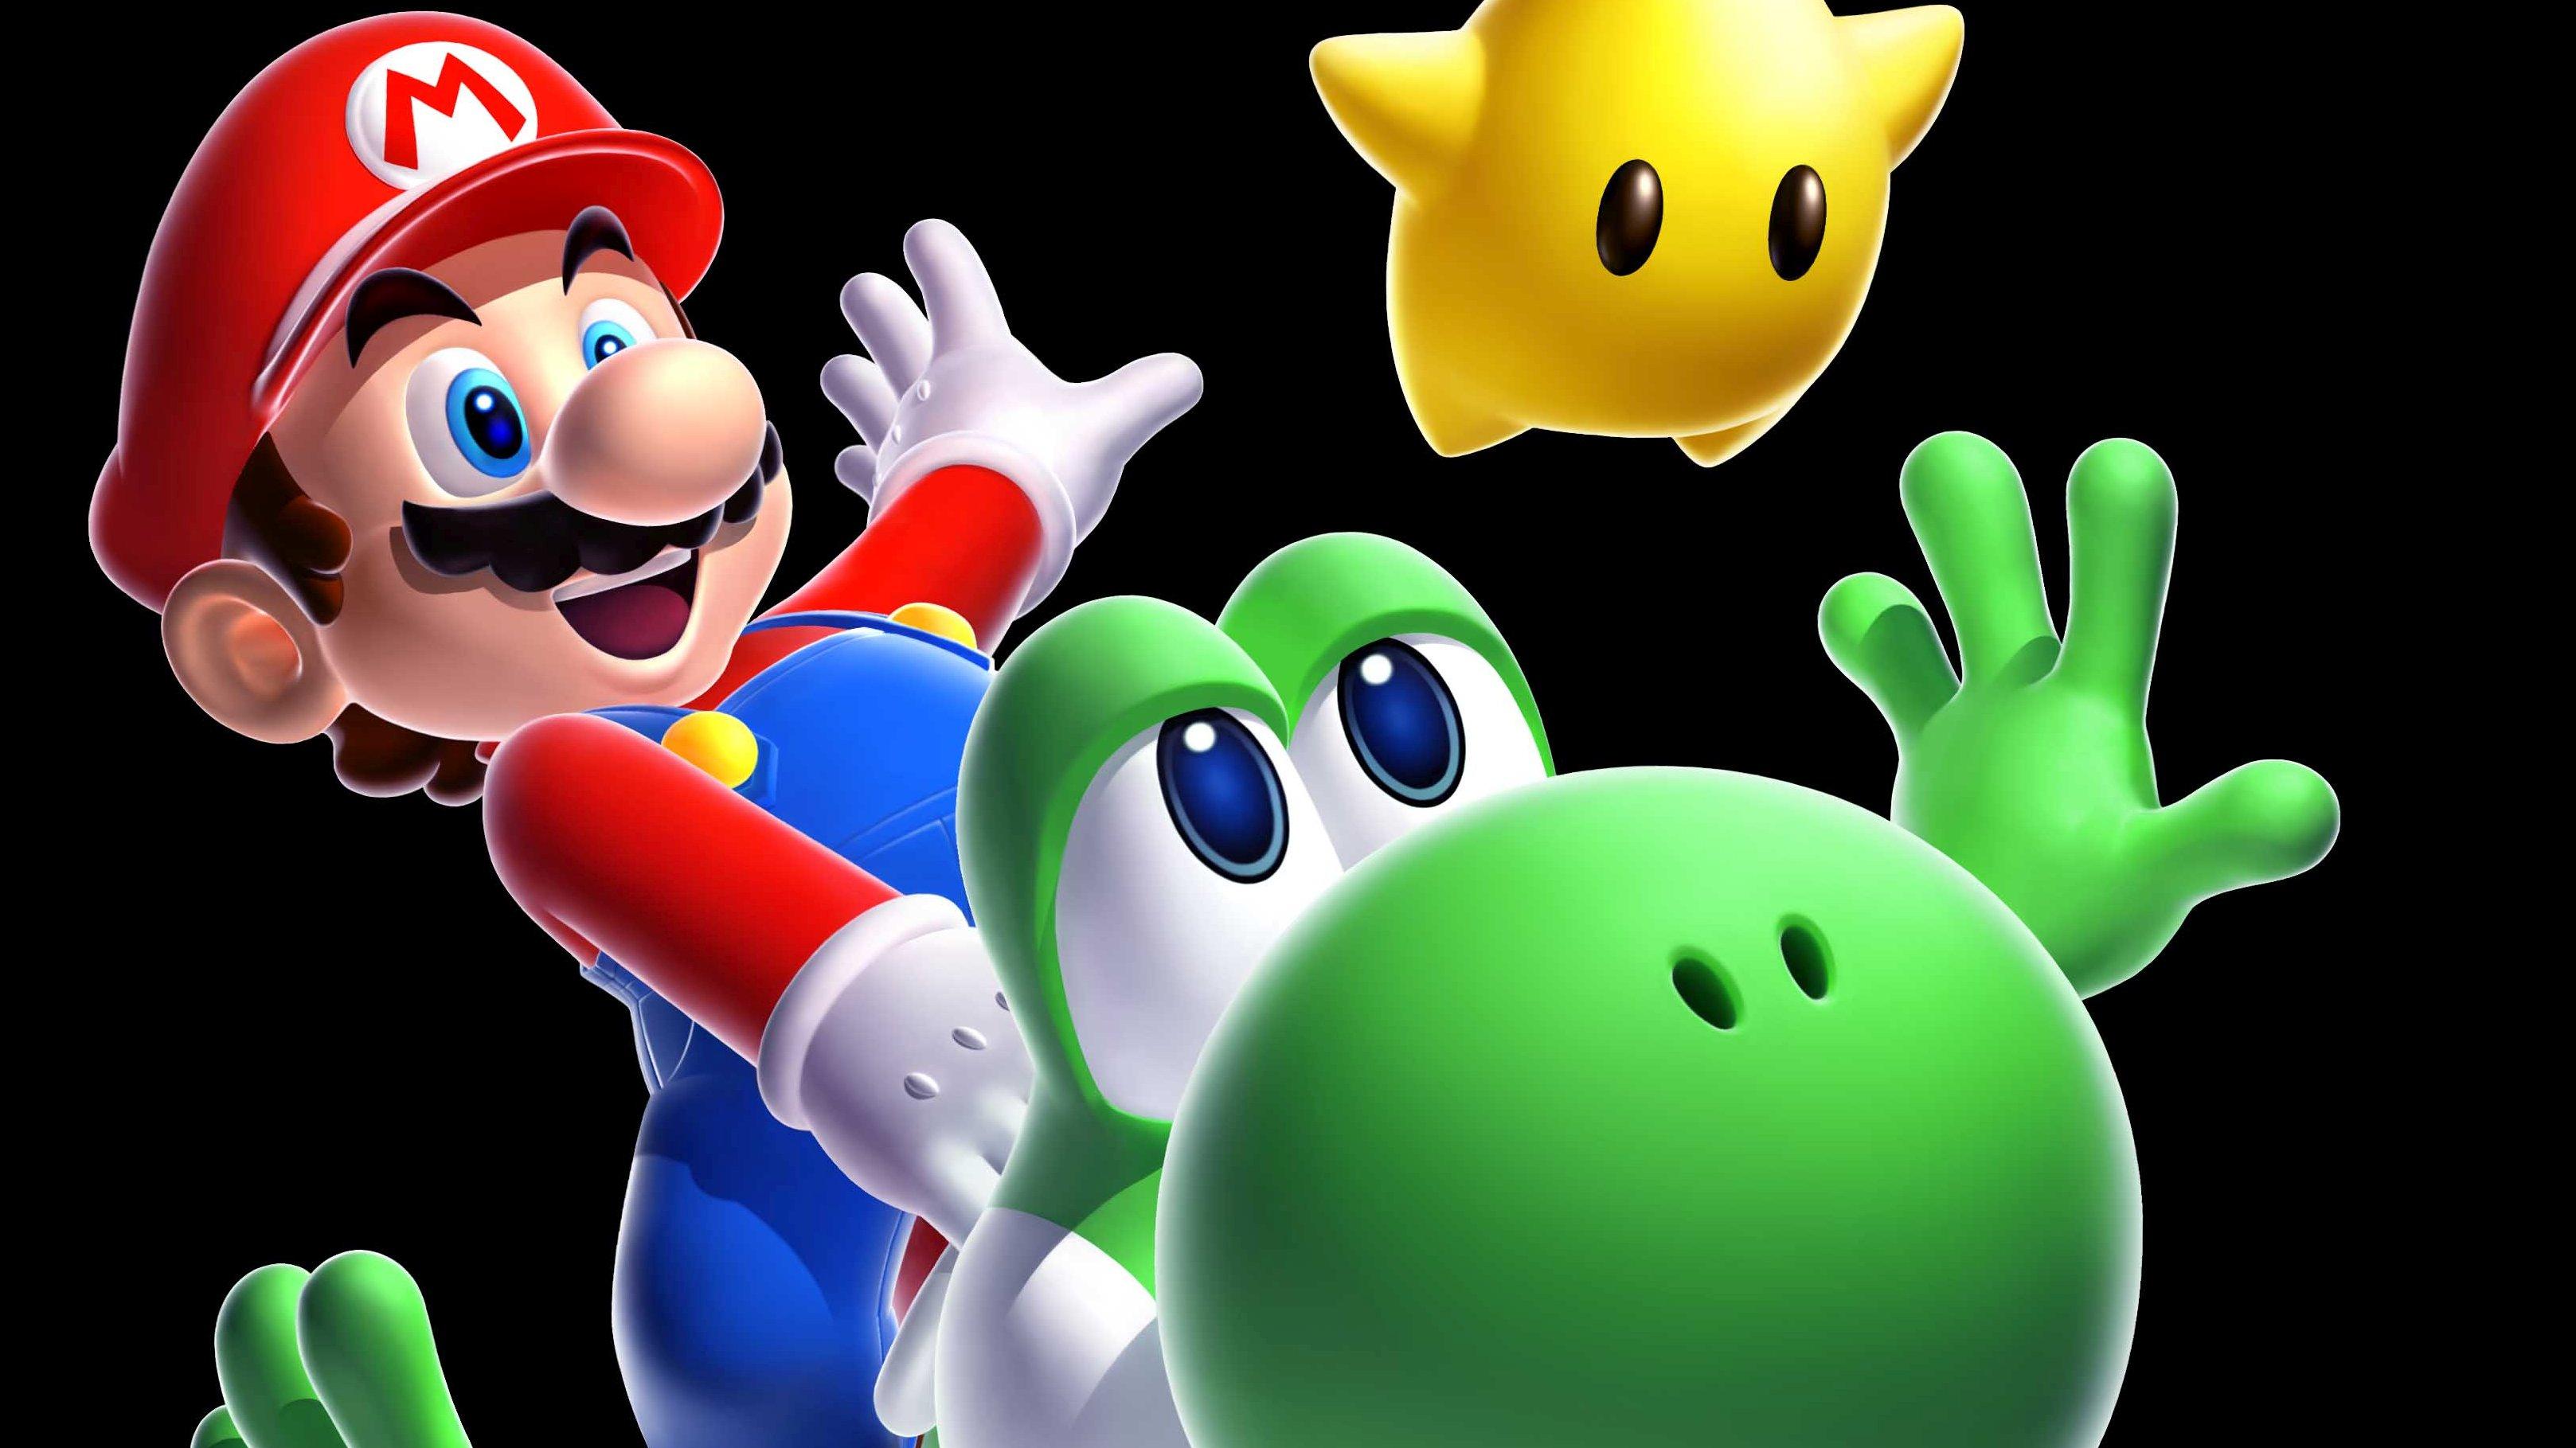 Unique Image De Mario Et Luigi A Imprimer